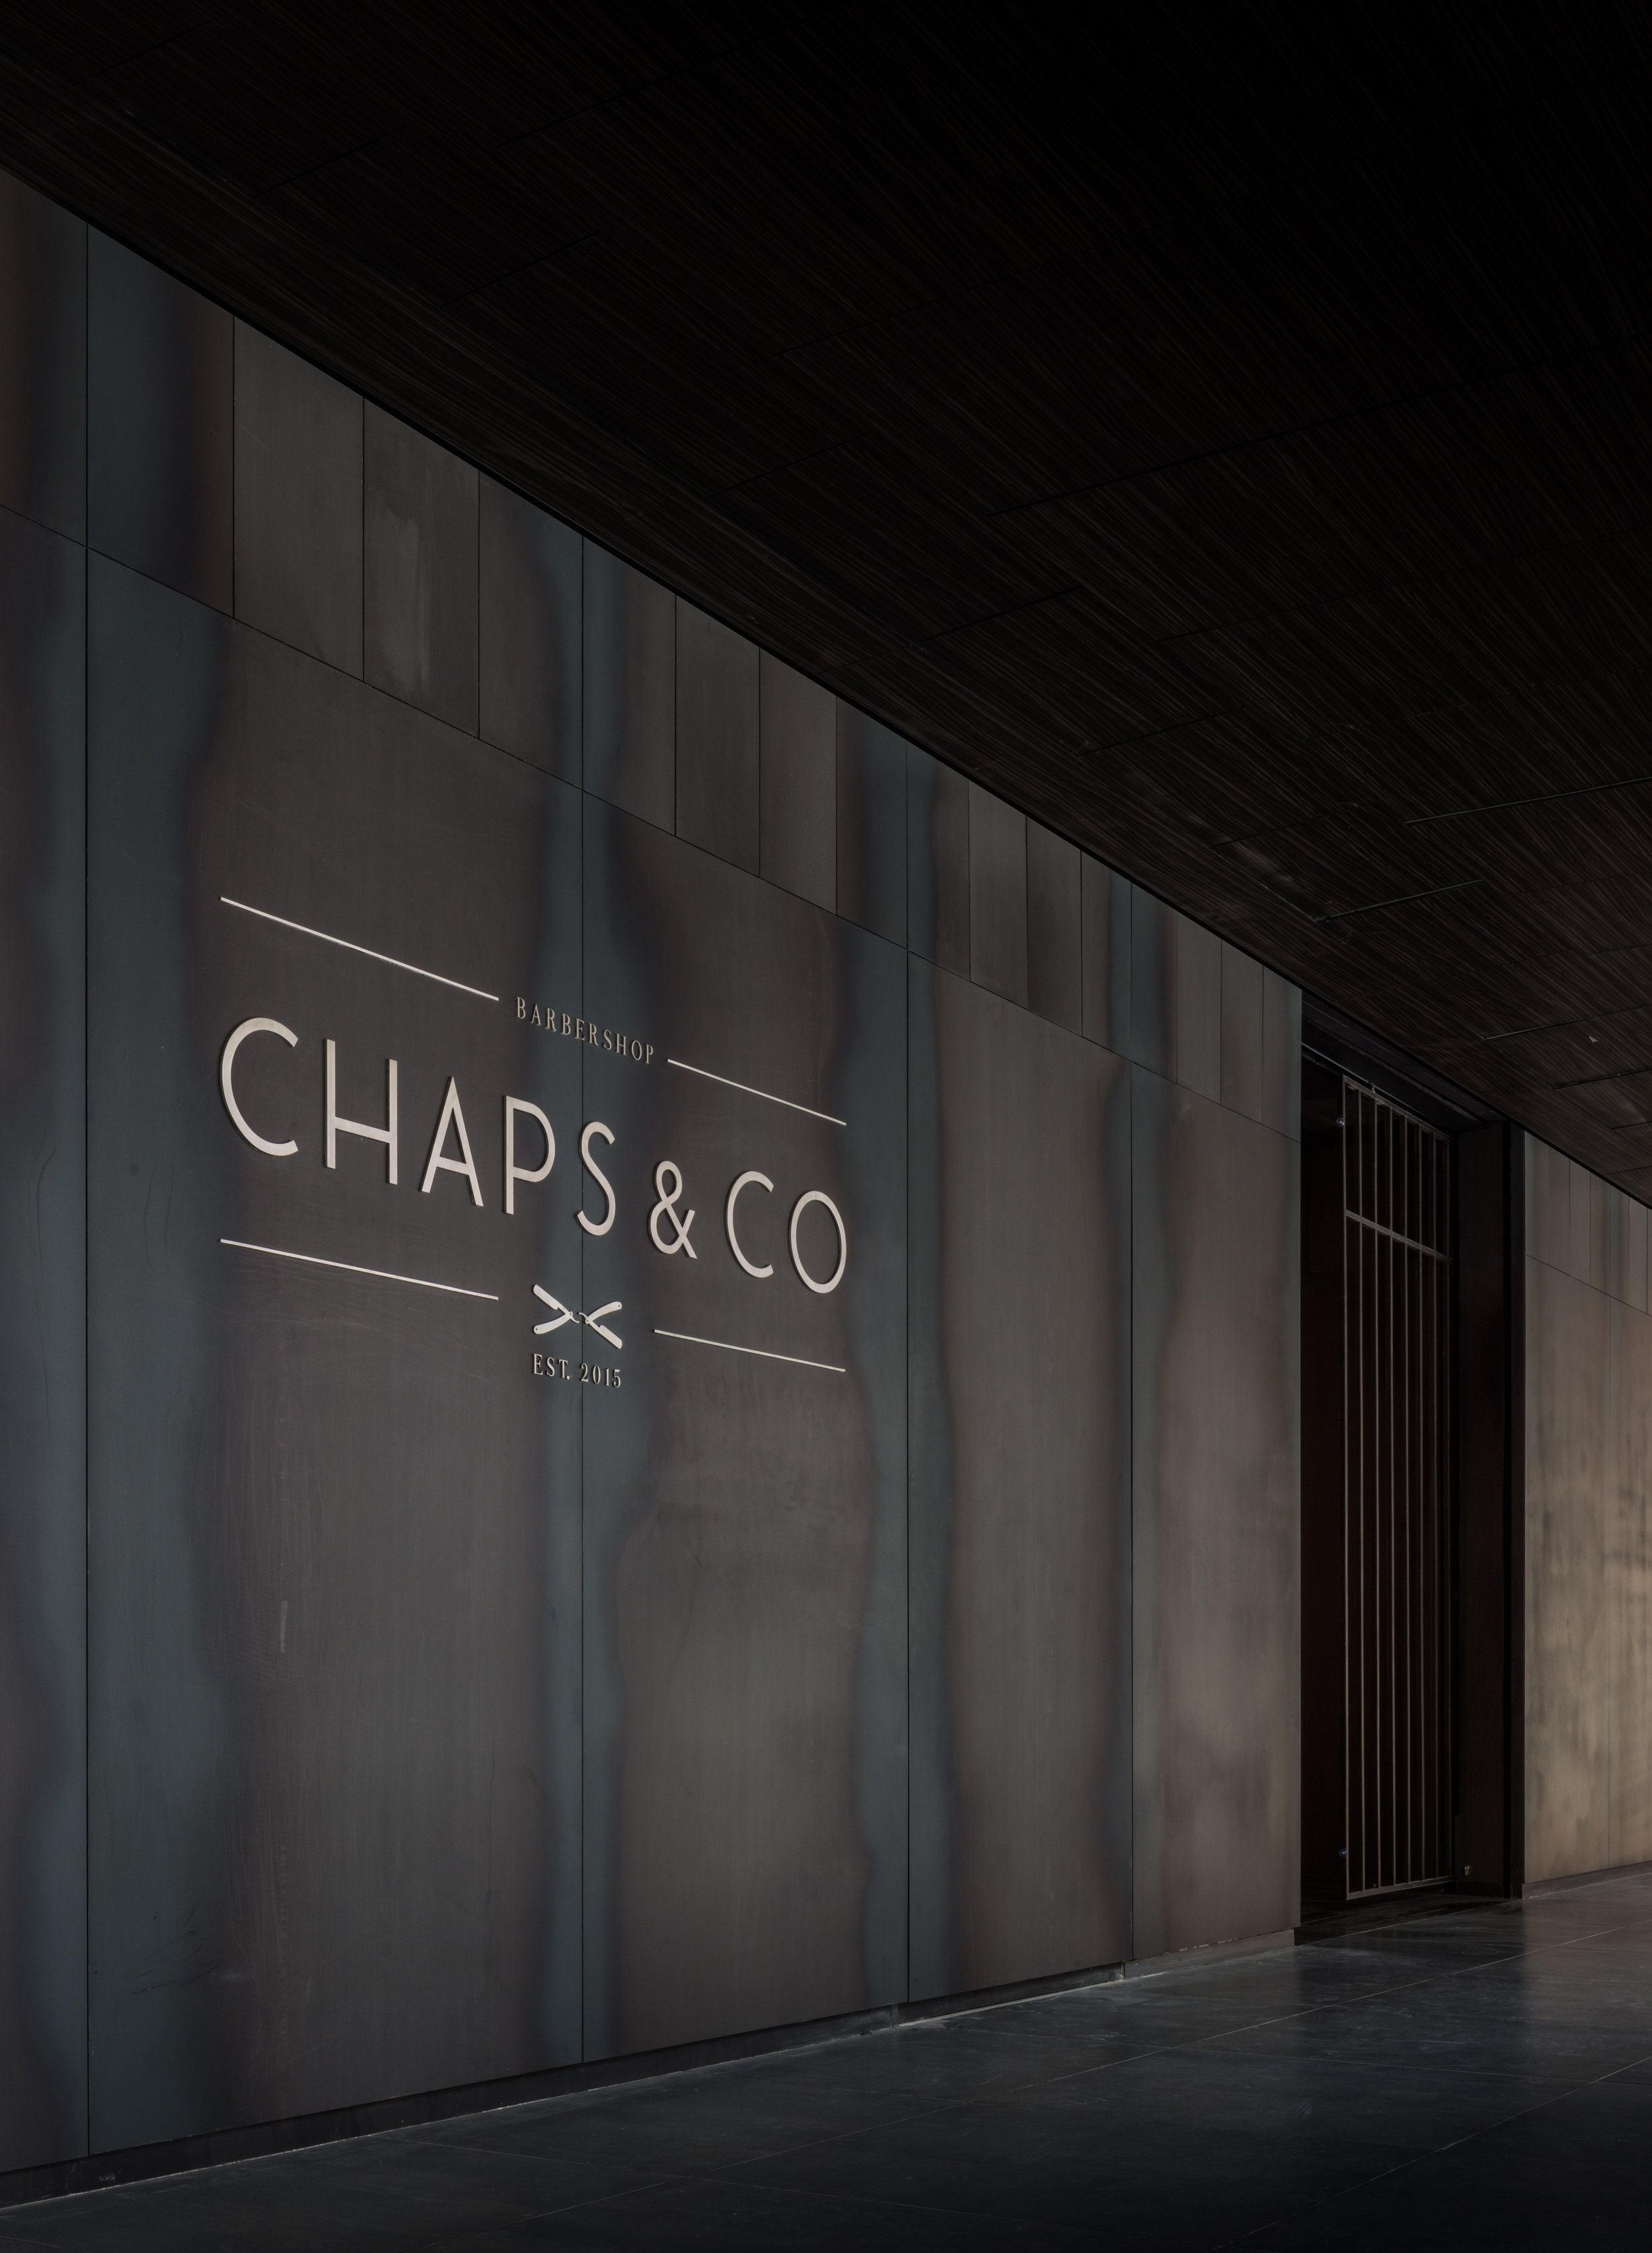 NW - Chaps & Co D3-4.jpg